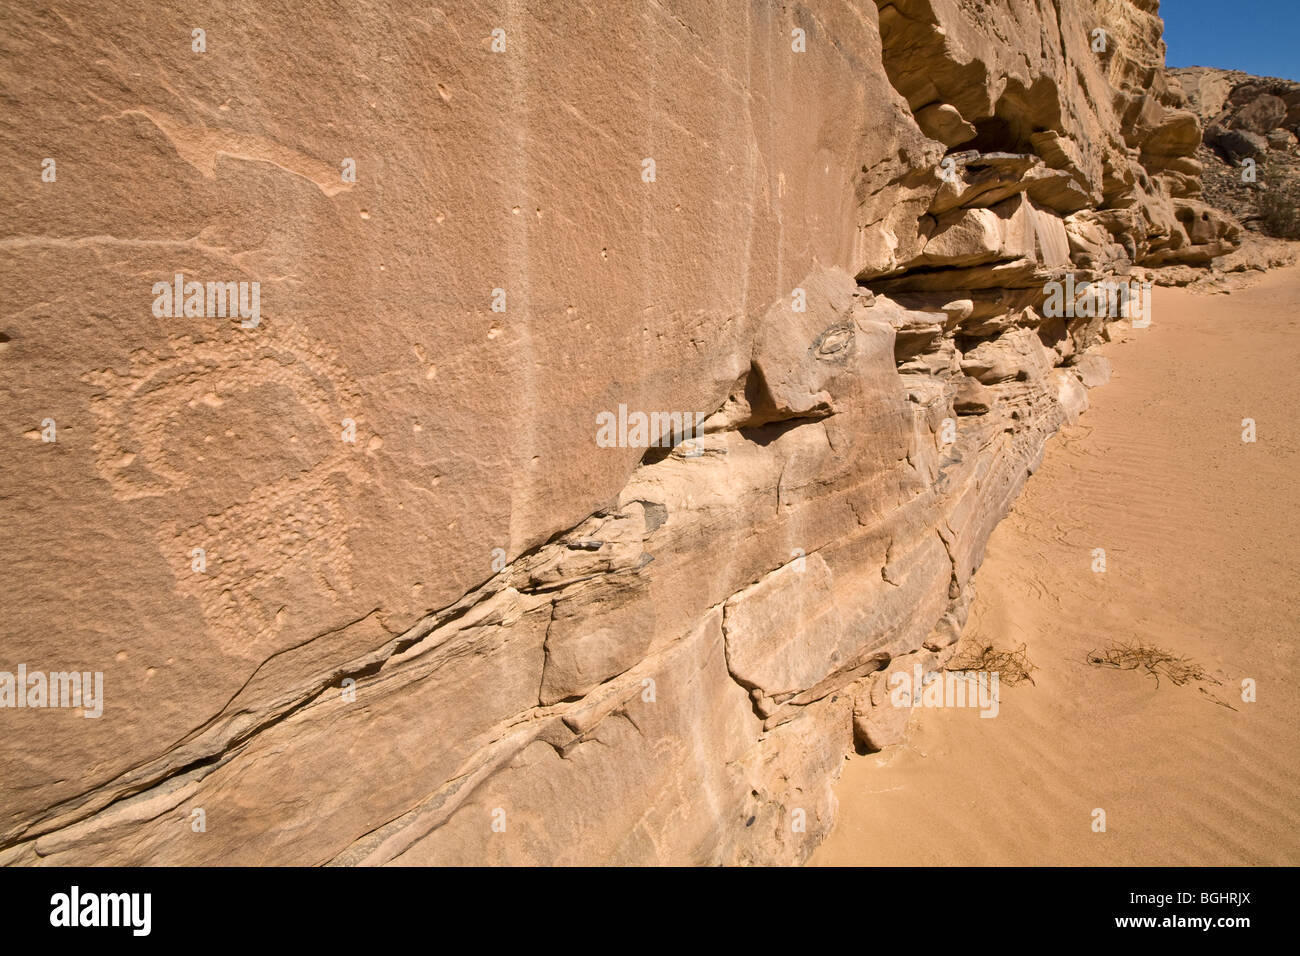 View along sandy wadi floor showing rock-Art of Ibex in the Eastern Desert of Egypt. - Stock Image